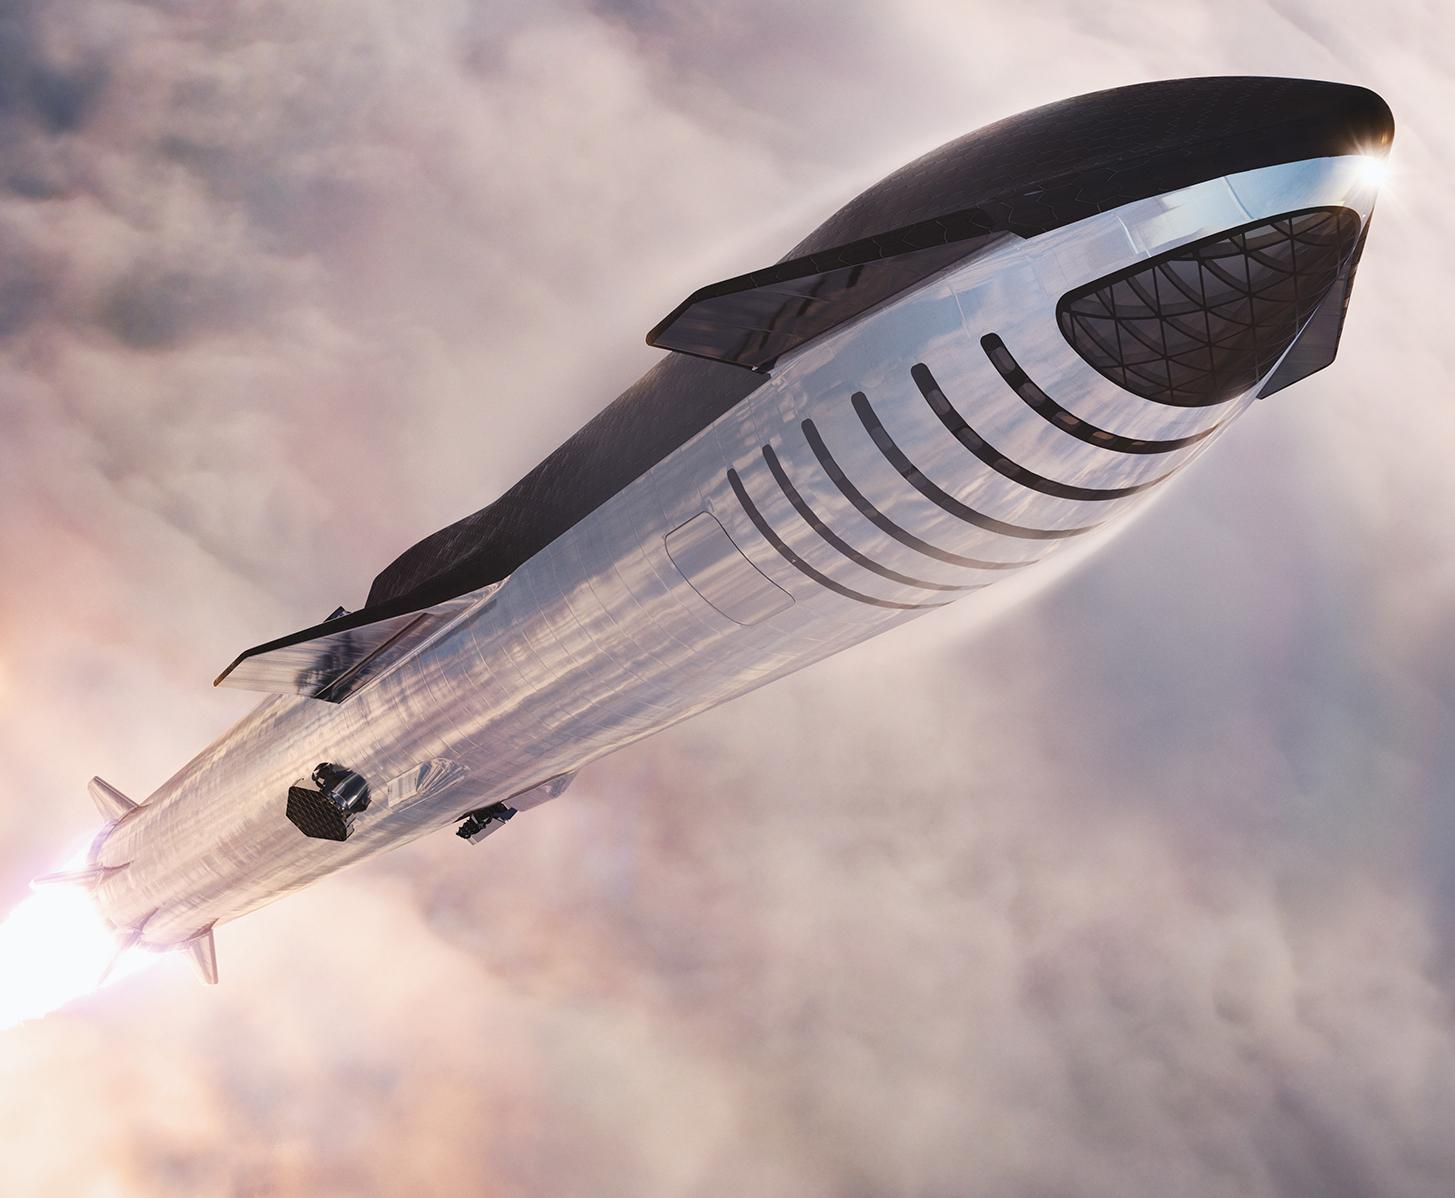 Original Space render of Starship in flight.